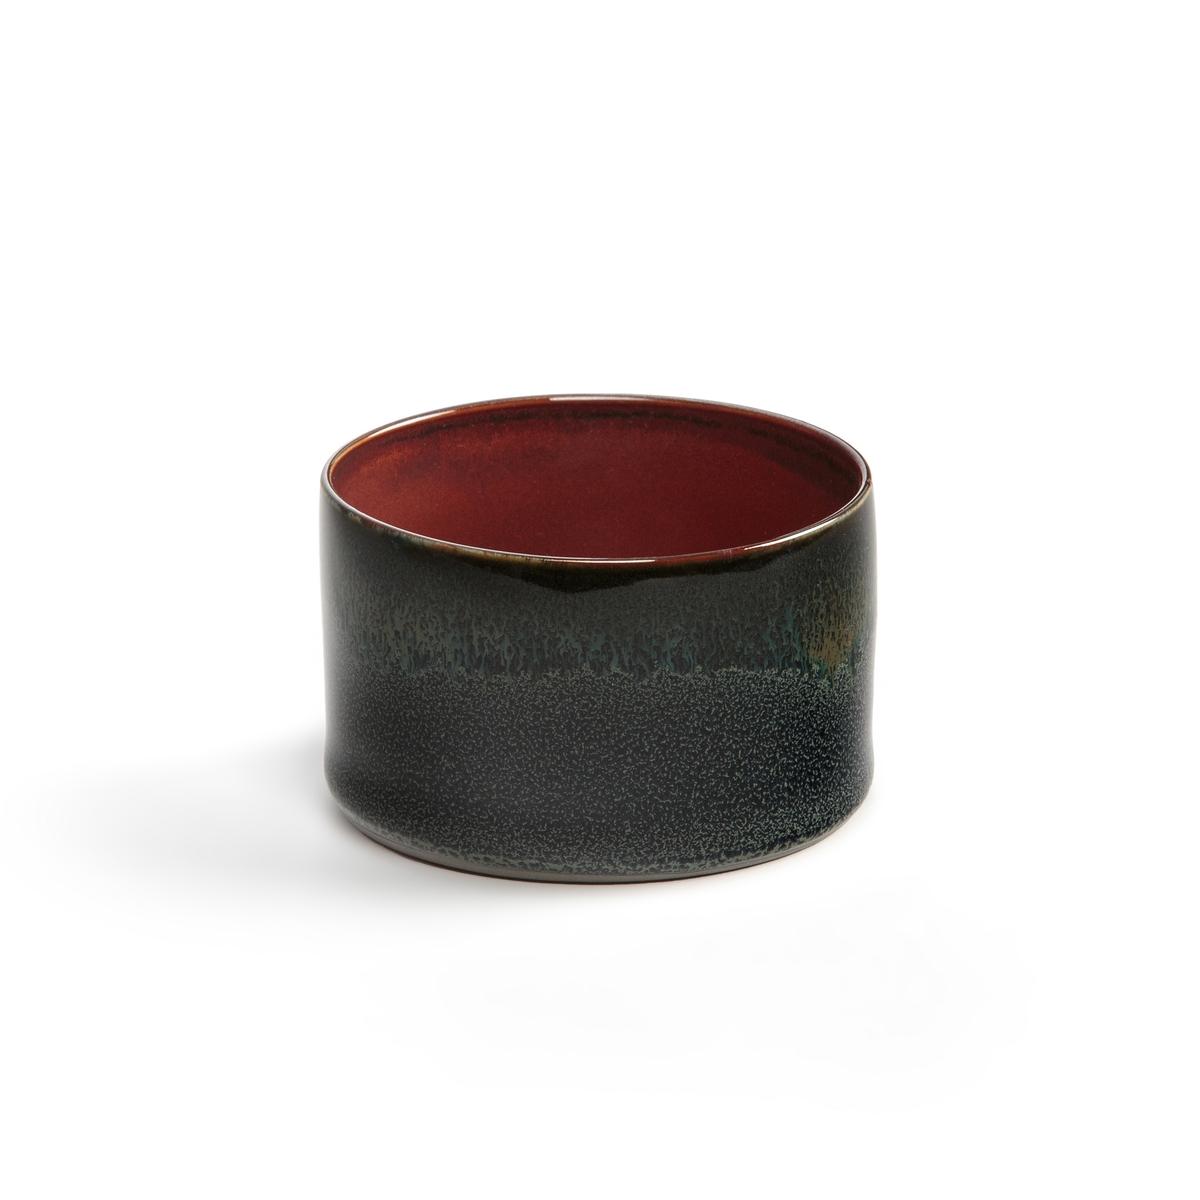 4 стакана из керамики Terre de rêves design Serax